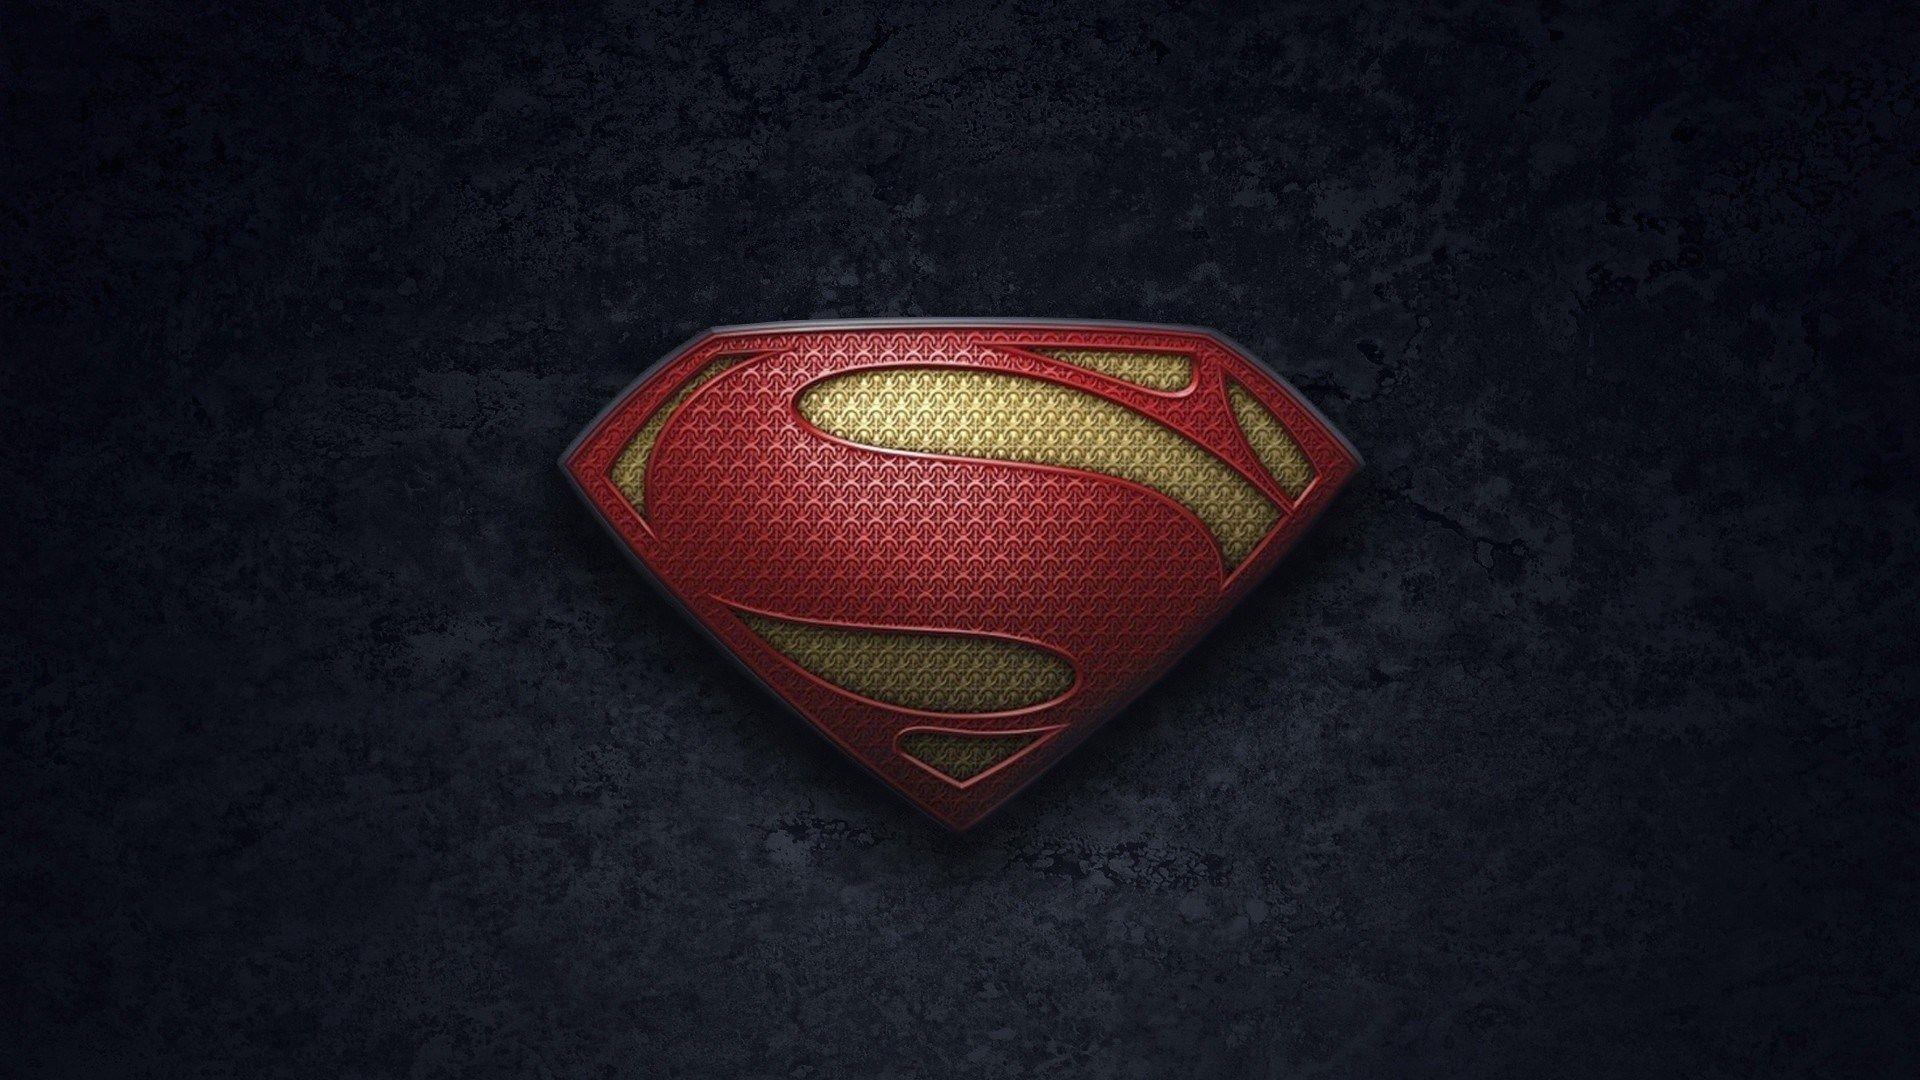 Superman Man Of Steel Wallpaper 1920 X 1080p